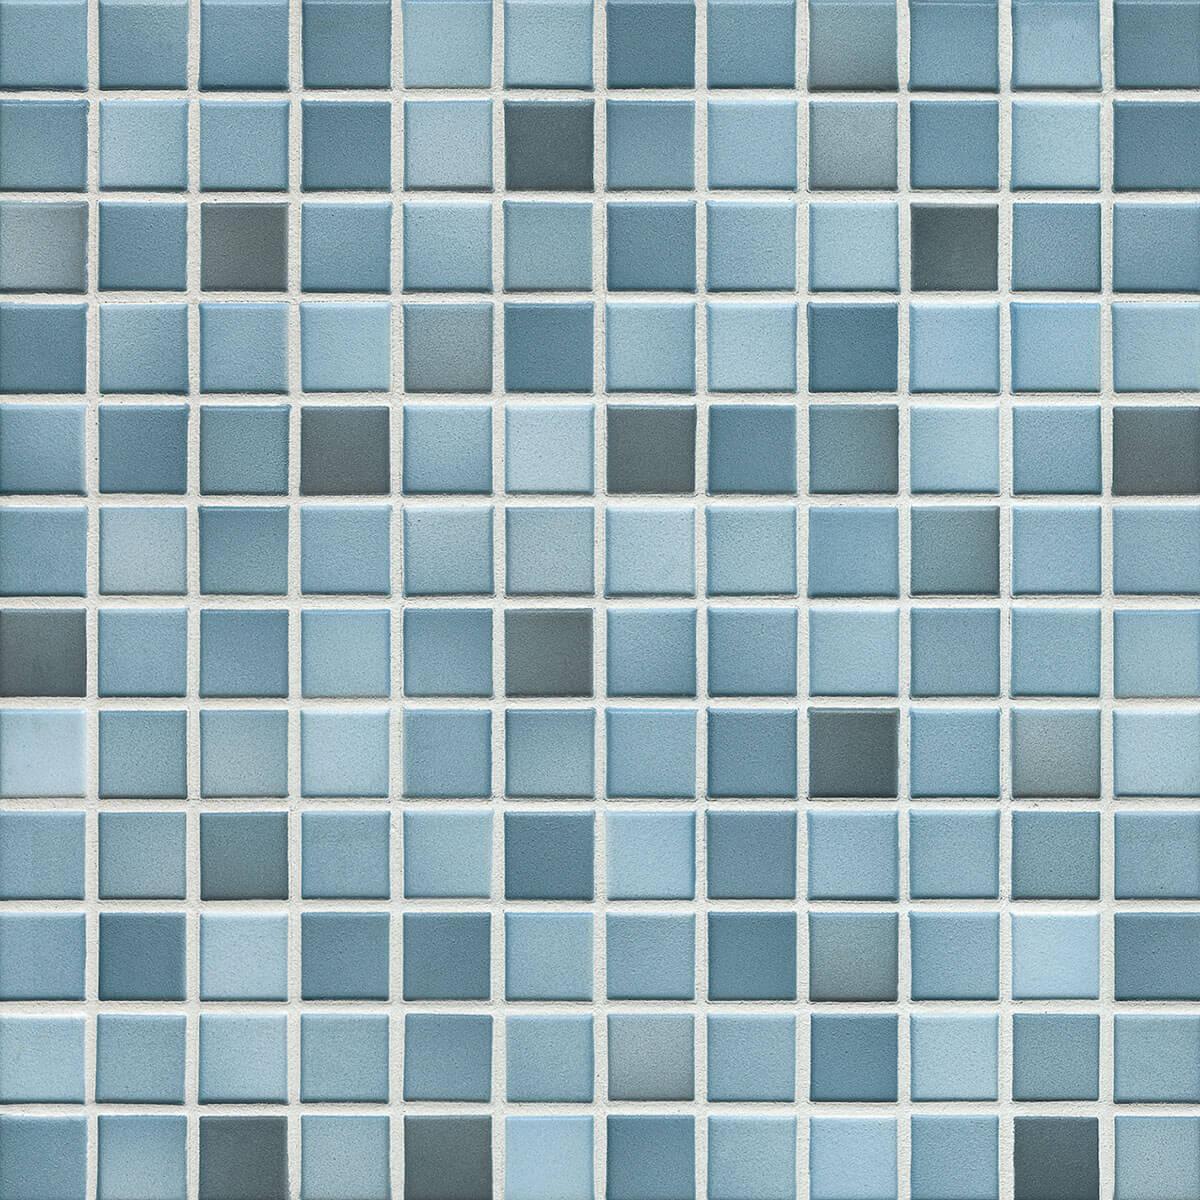 Agrob Buchtal Tiles - KLAY_Fresh-_0004_Fresh_Mix_Secura_F41306H-1